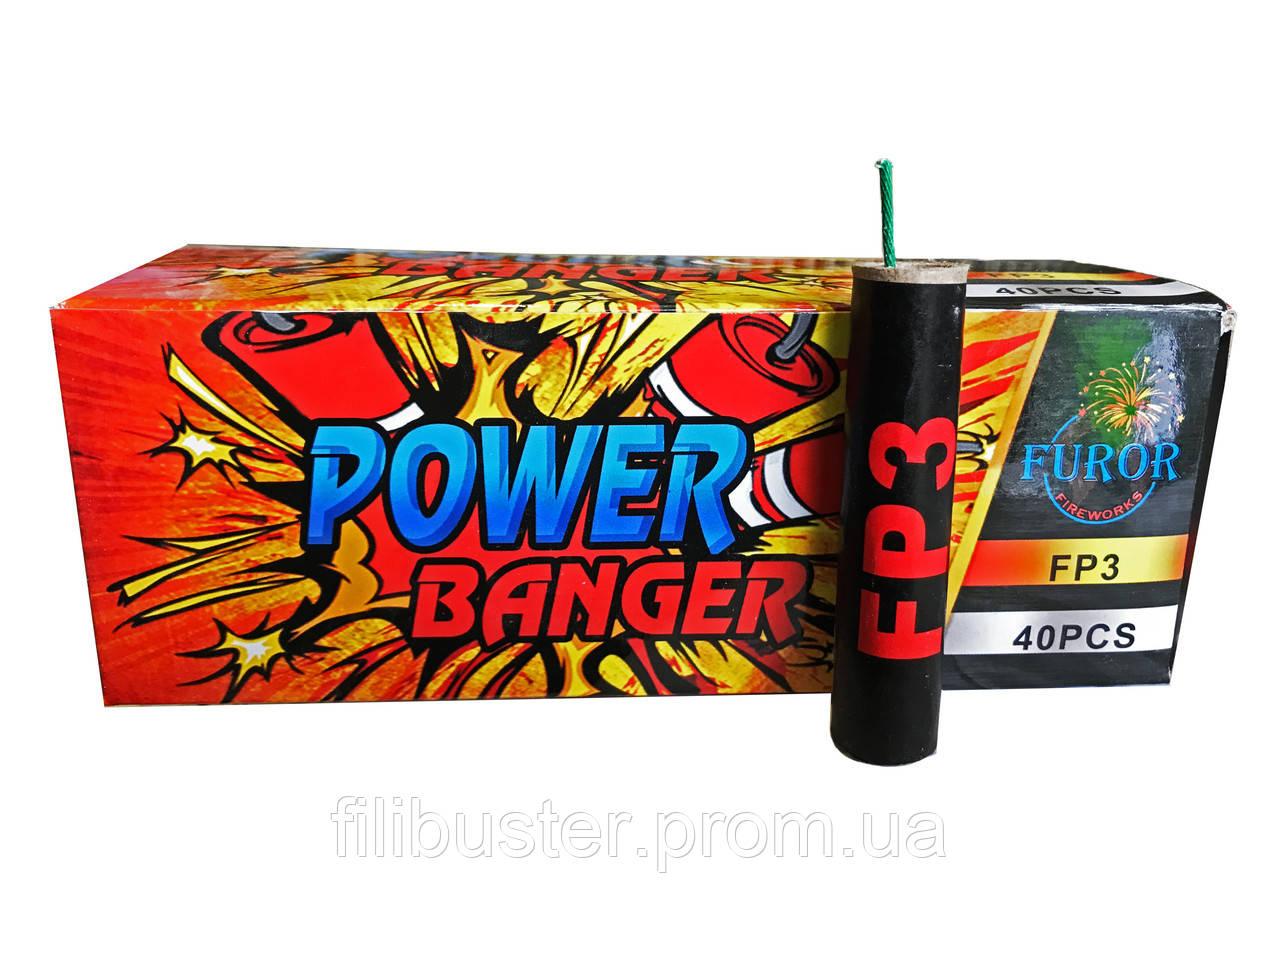 Петарда Furor Power Banger 40 шт FP3